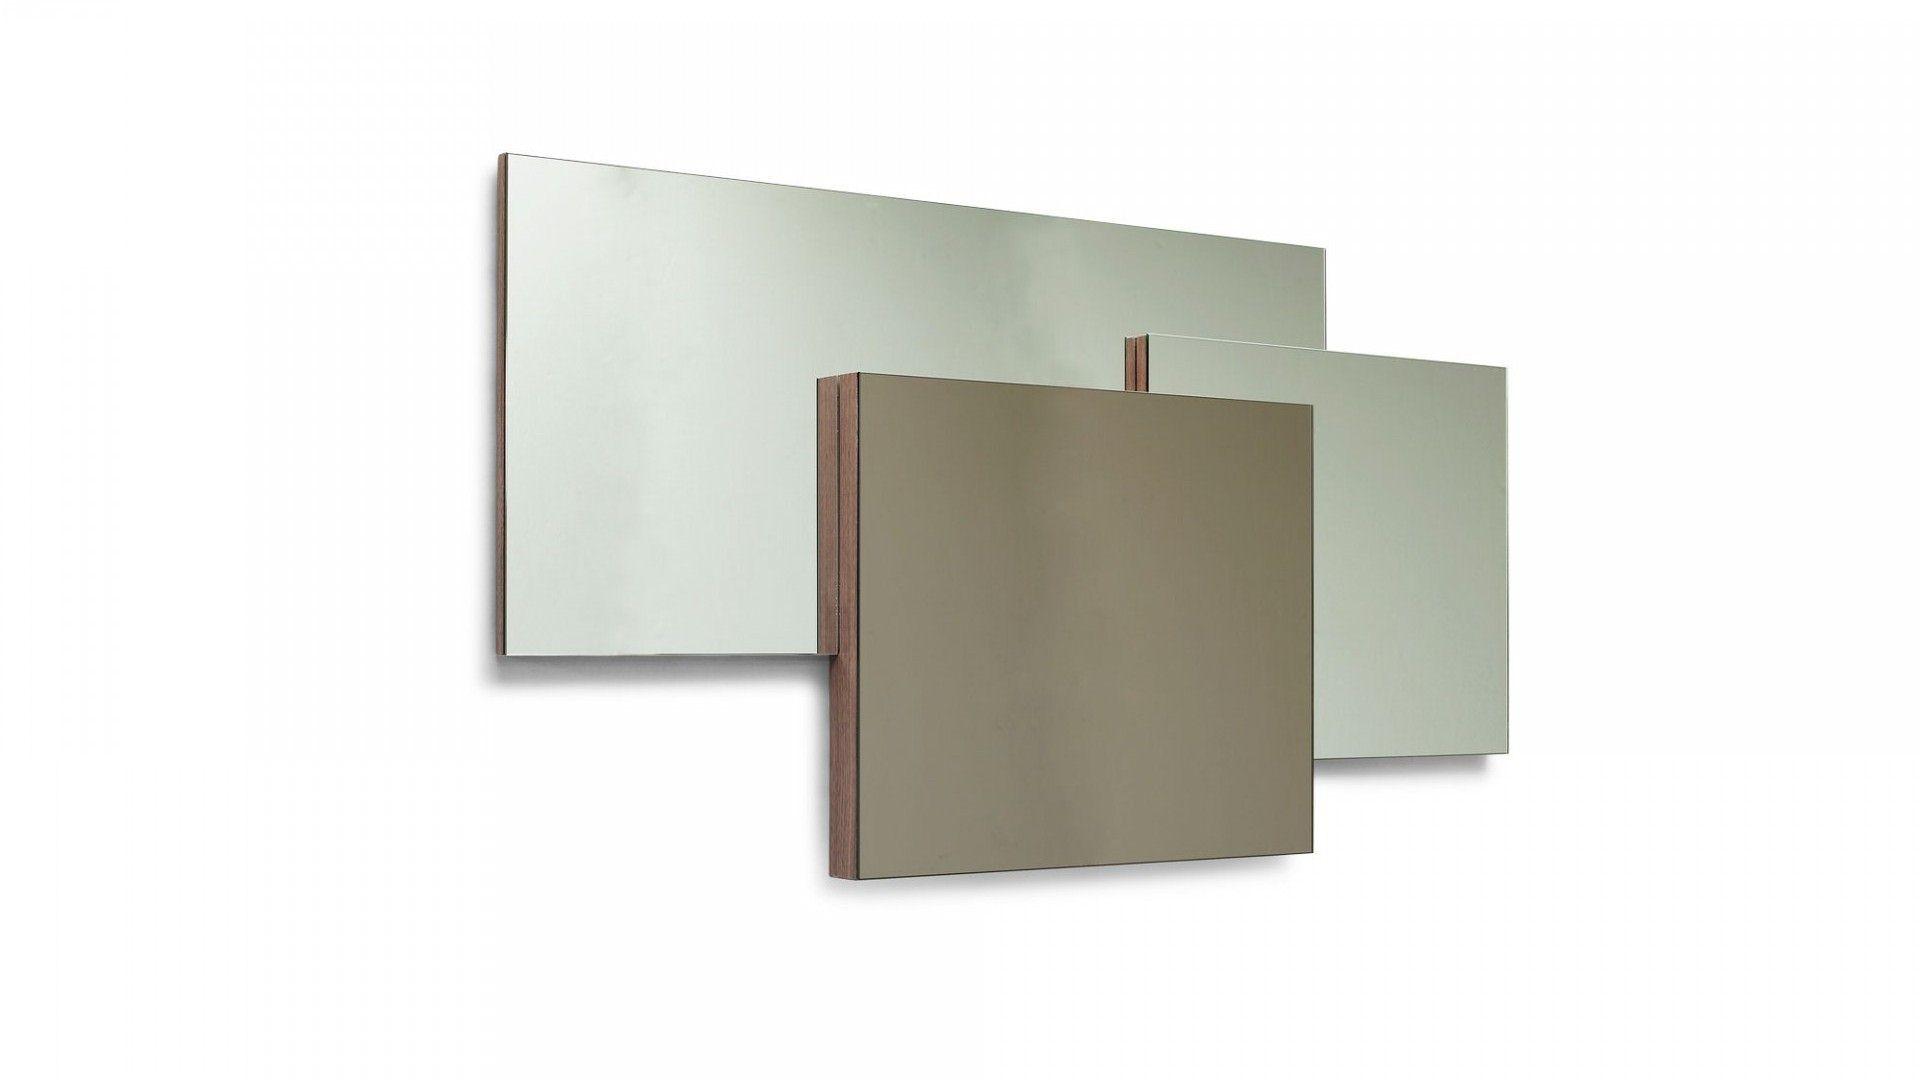 y003vm0-blocks-specchio-bronzo-1920x1080-2